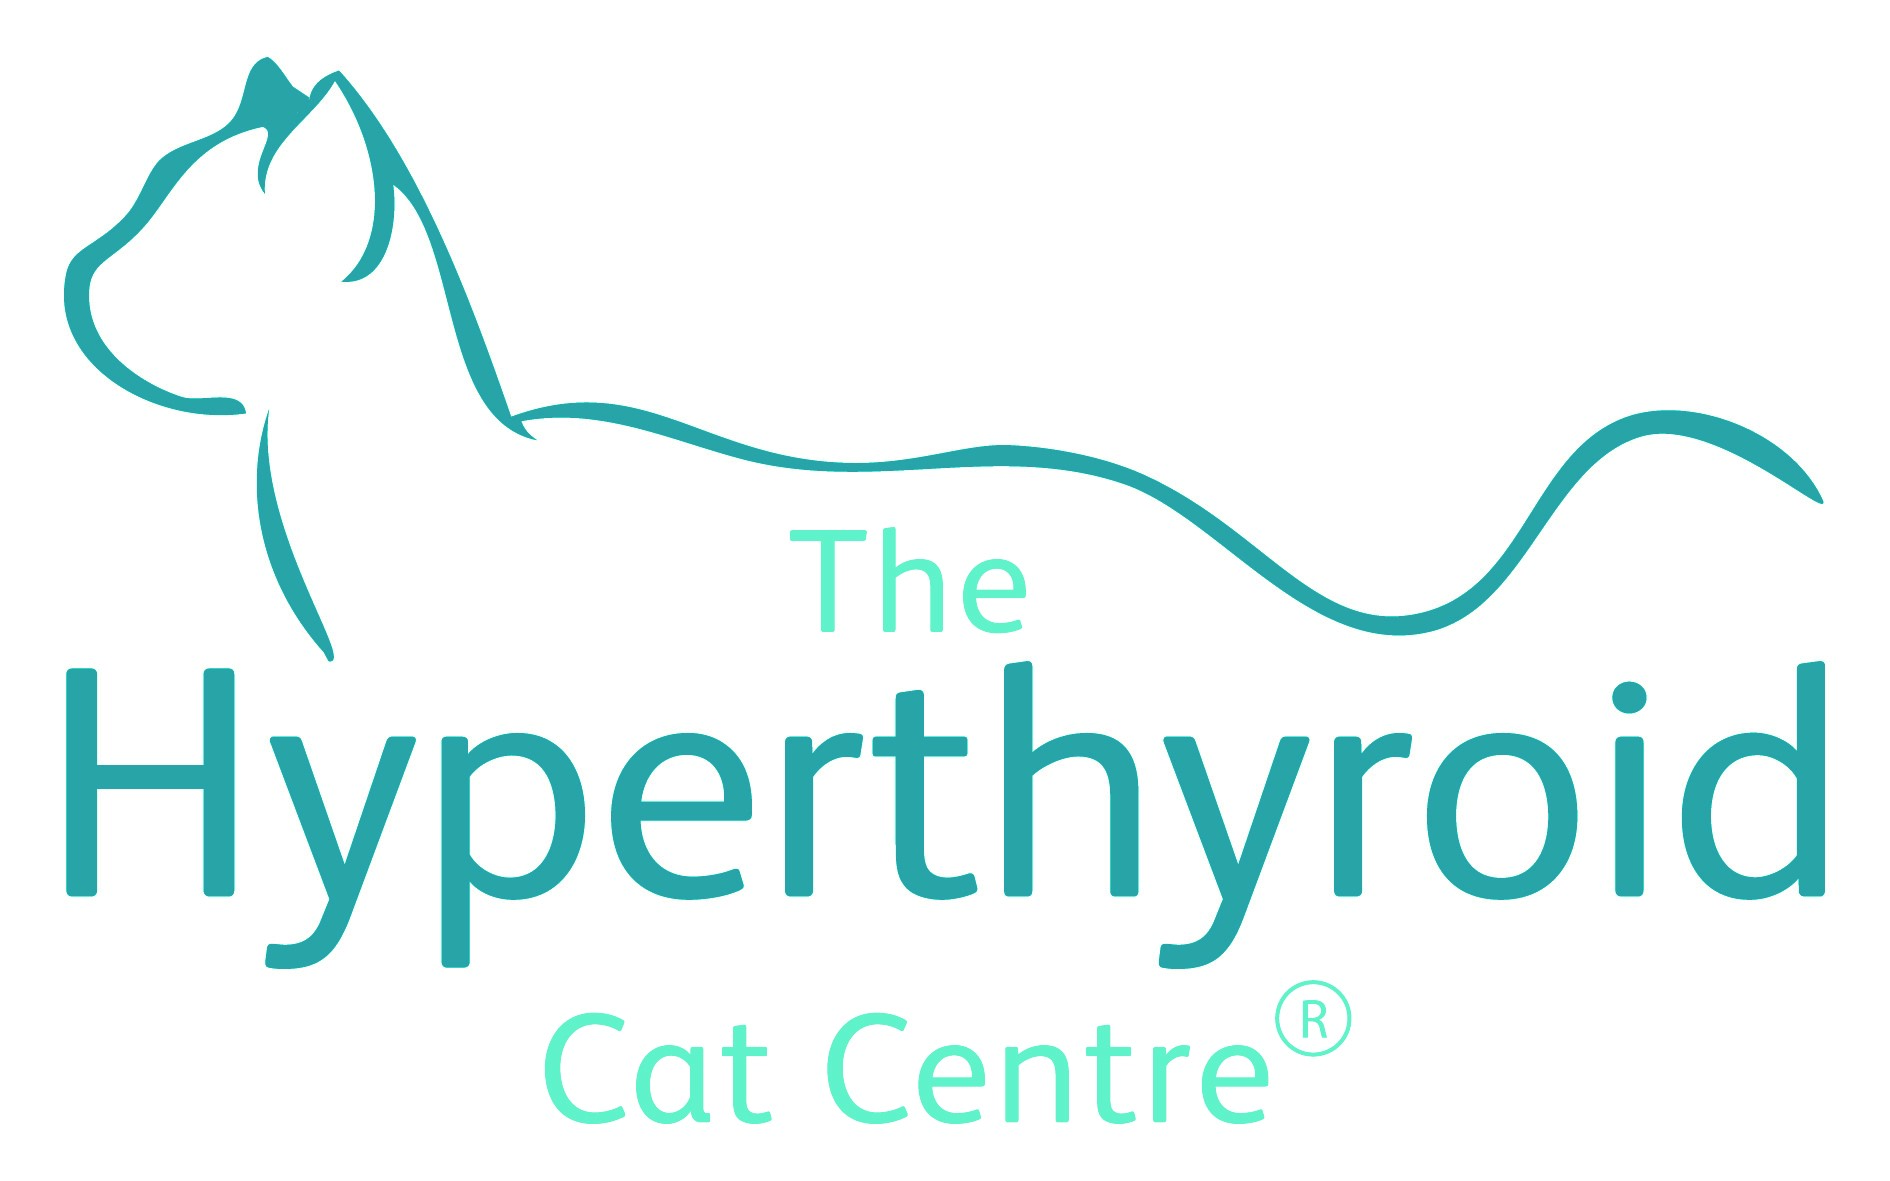 Hyperthyroid Cat Centre Ltd